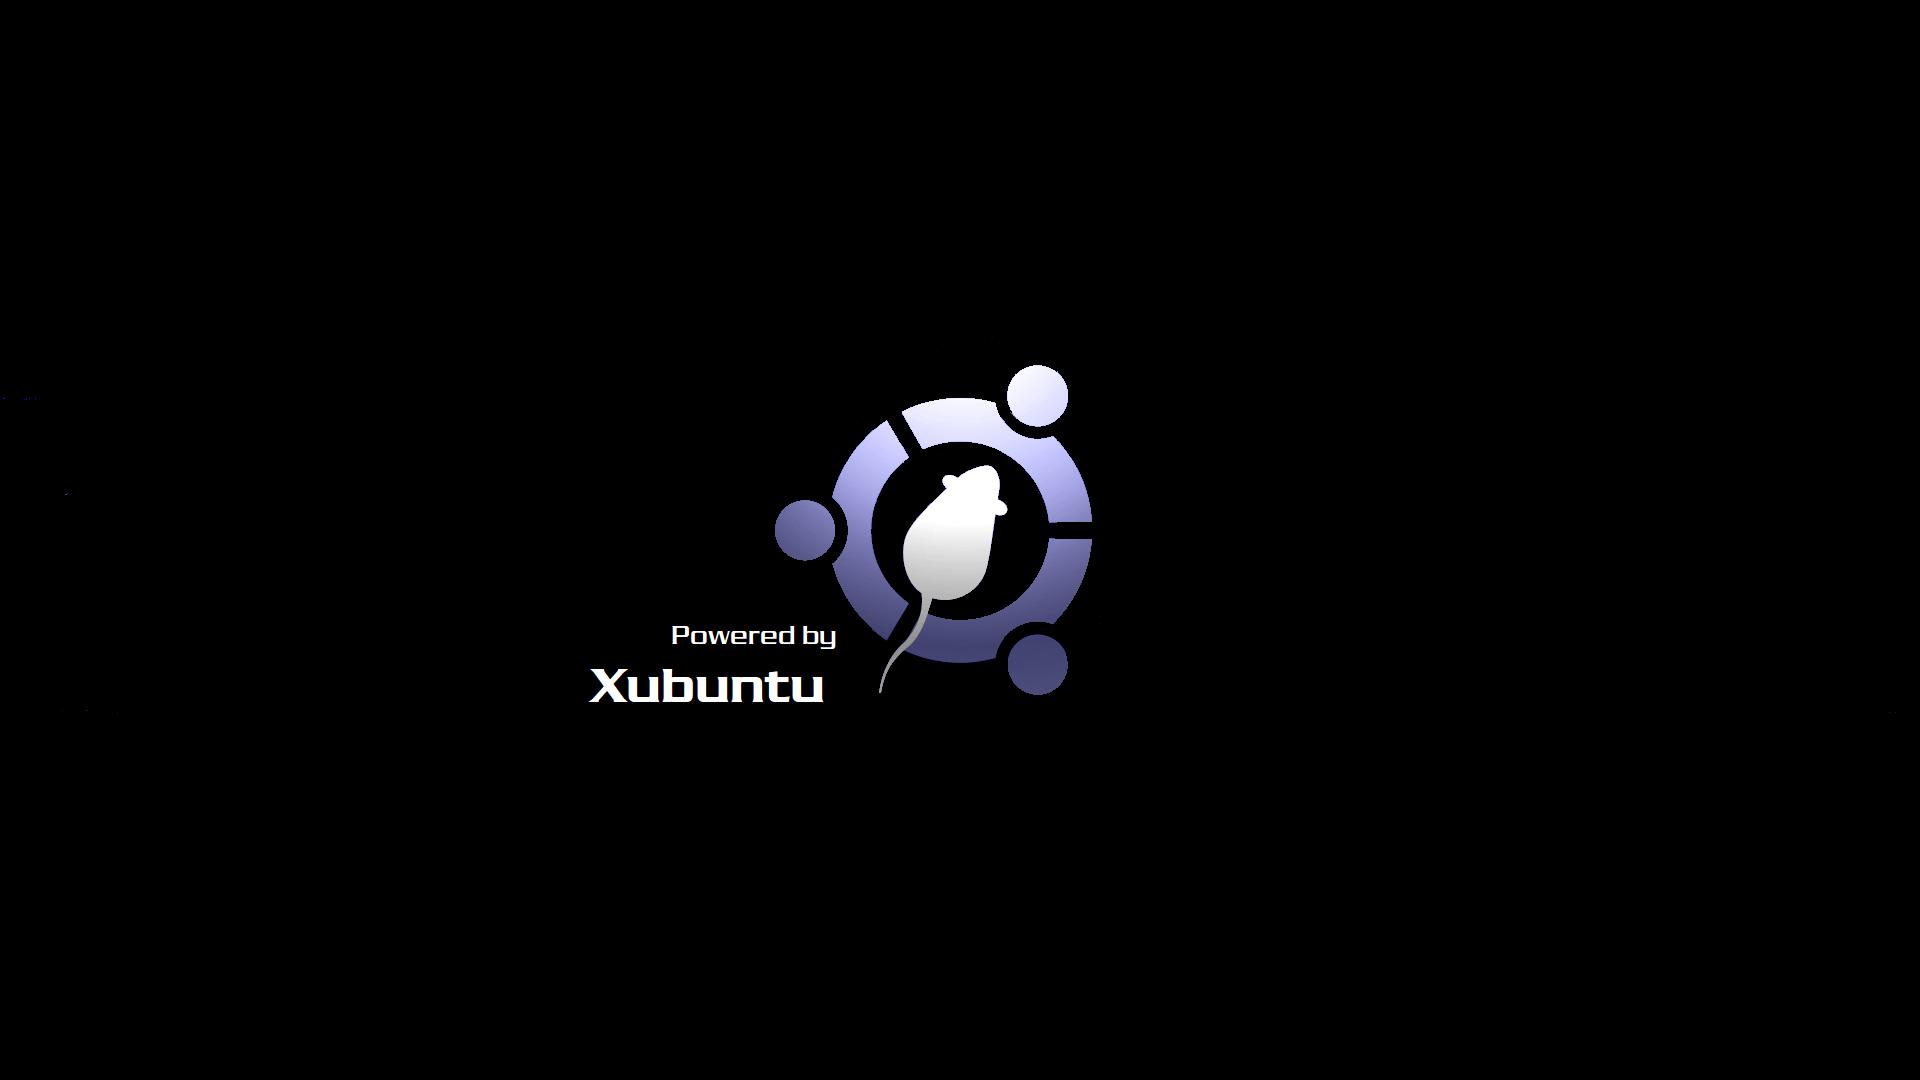 xfce wallpaper hd free themes screenshots xfce forums